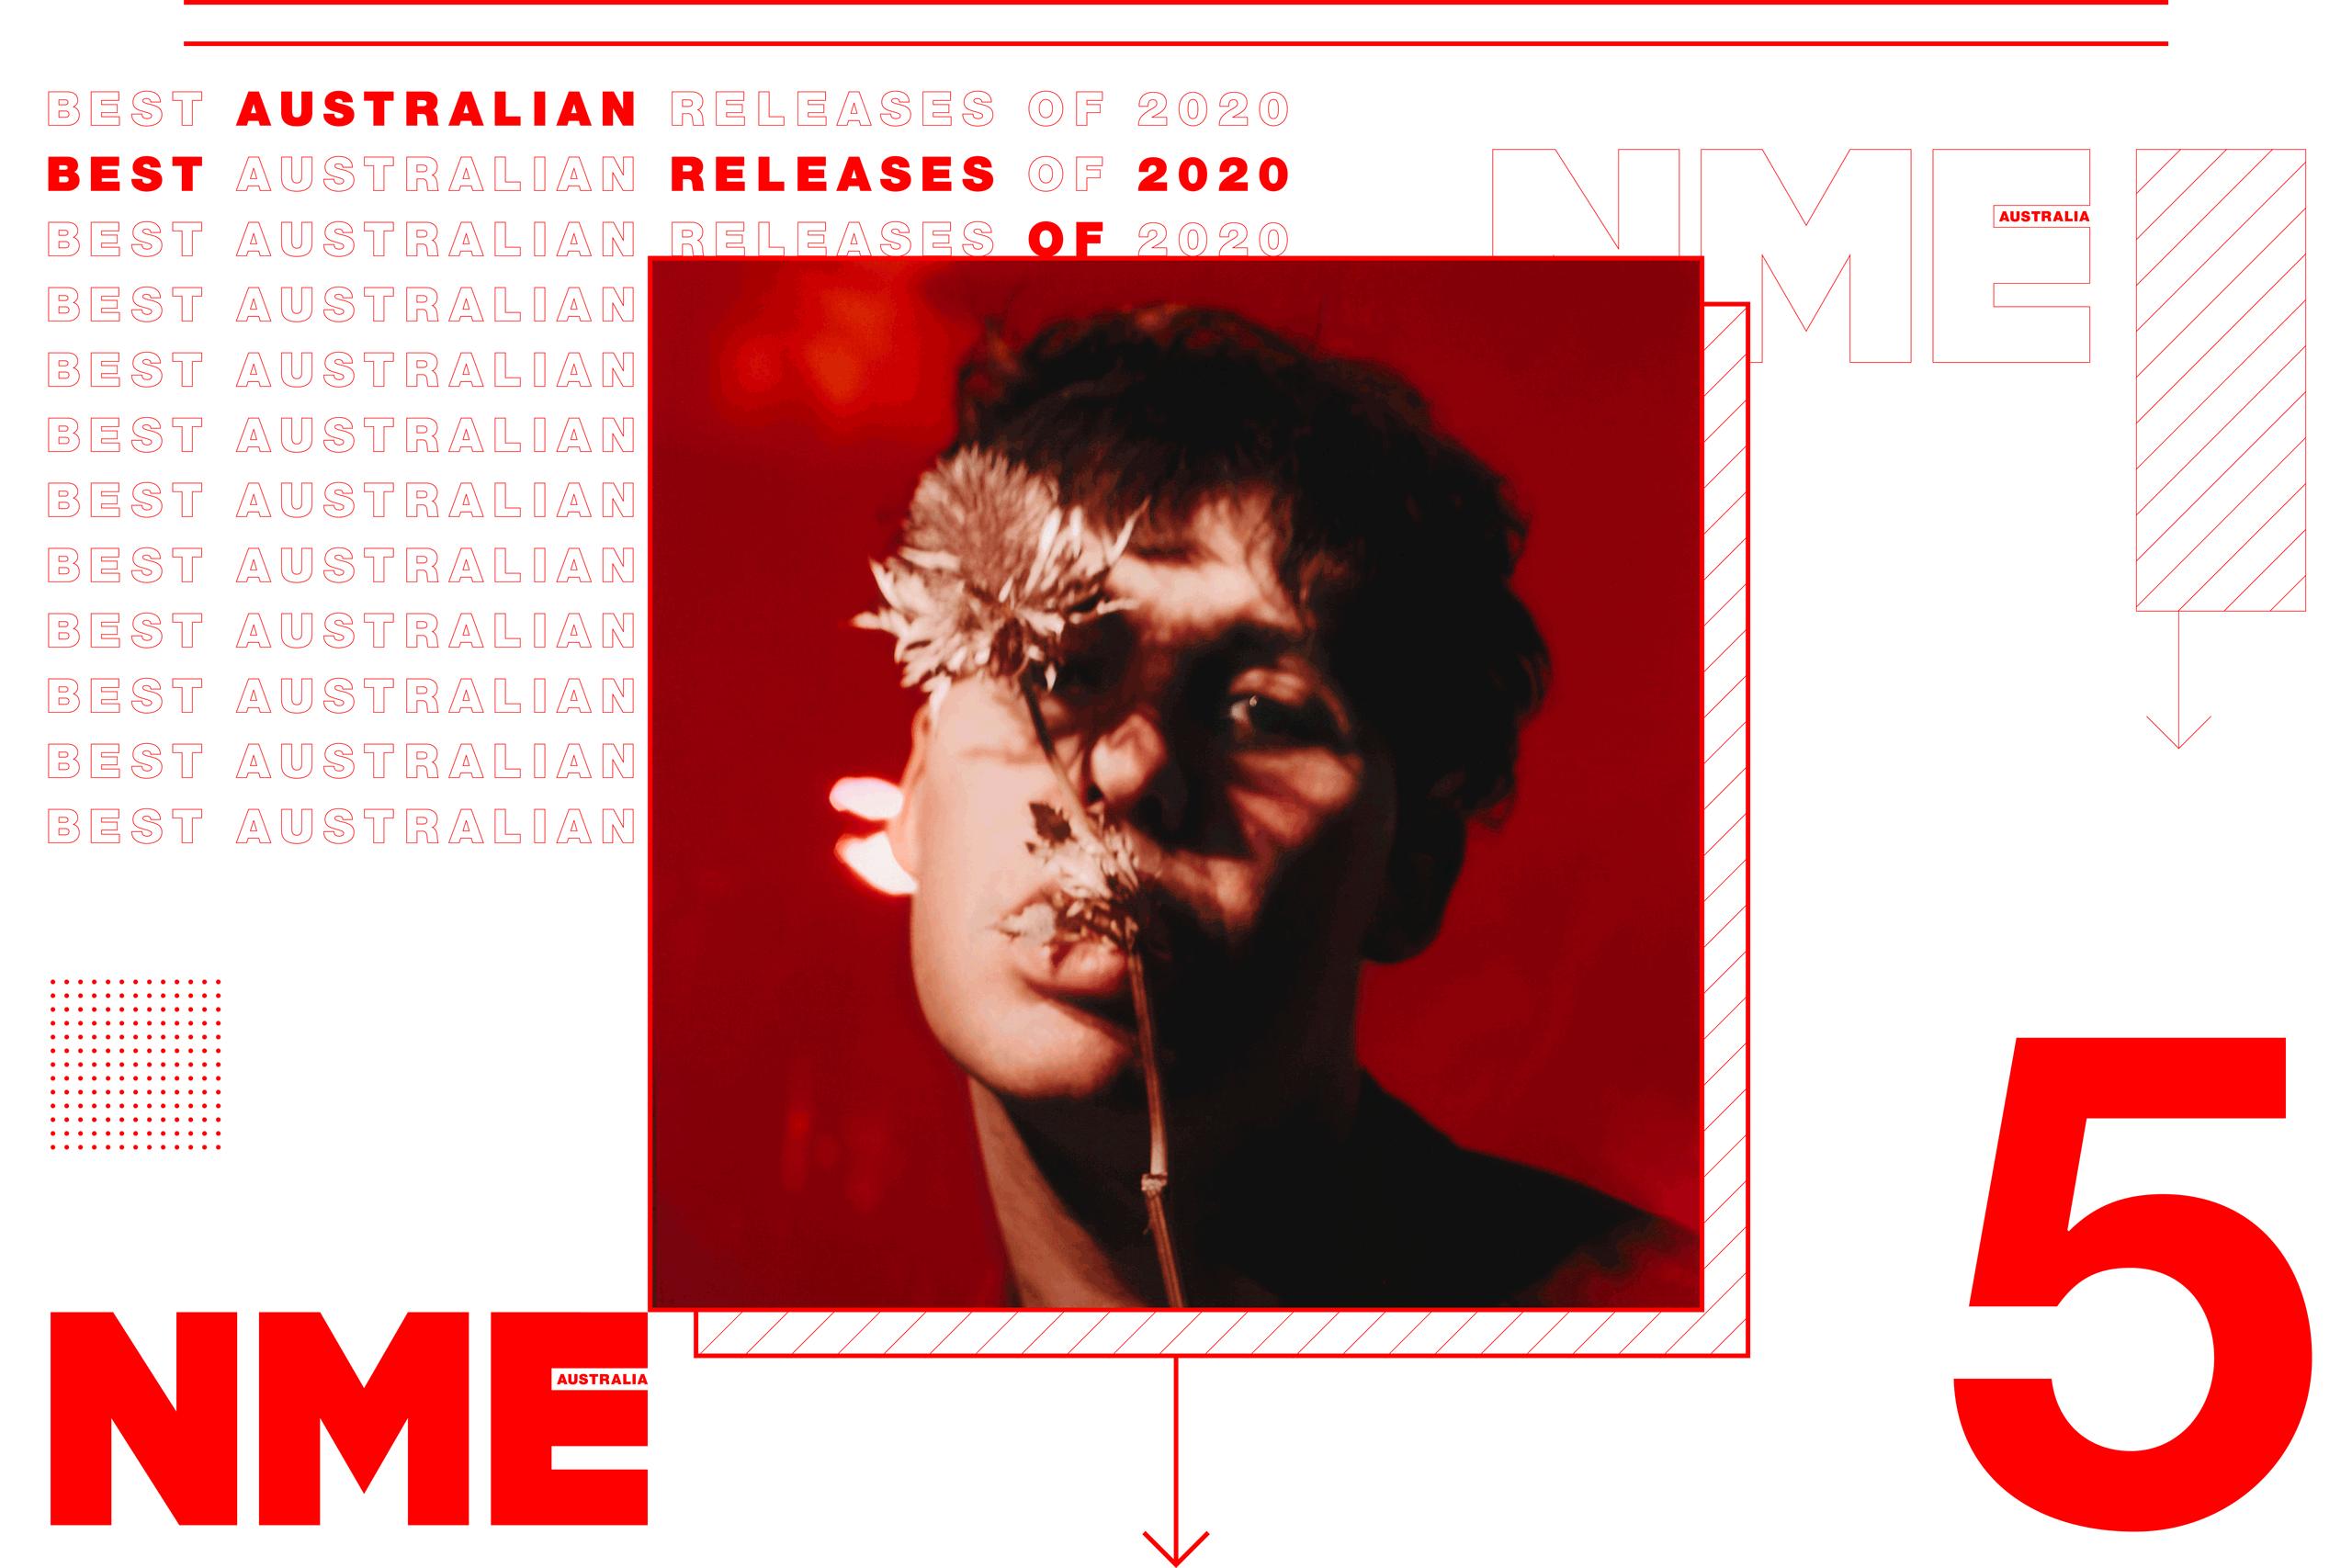 NME Australian Album Release 5